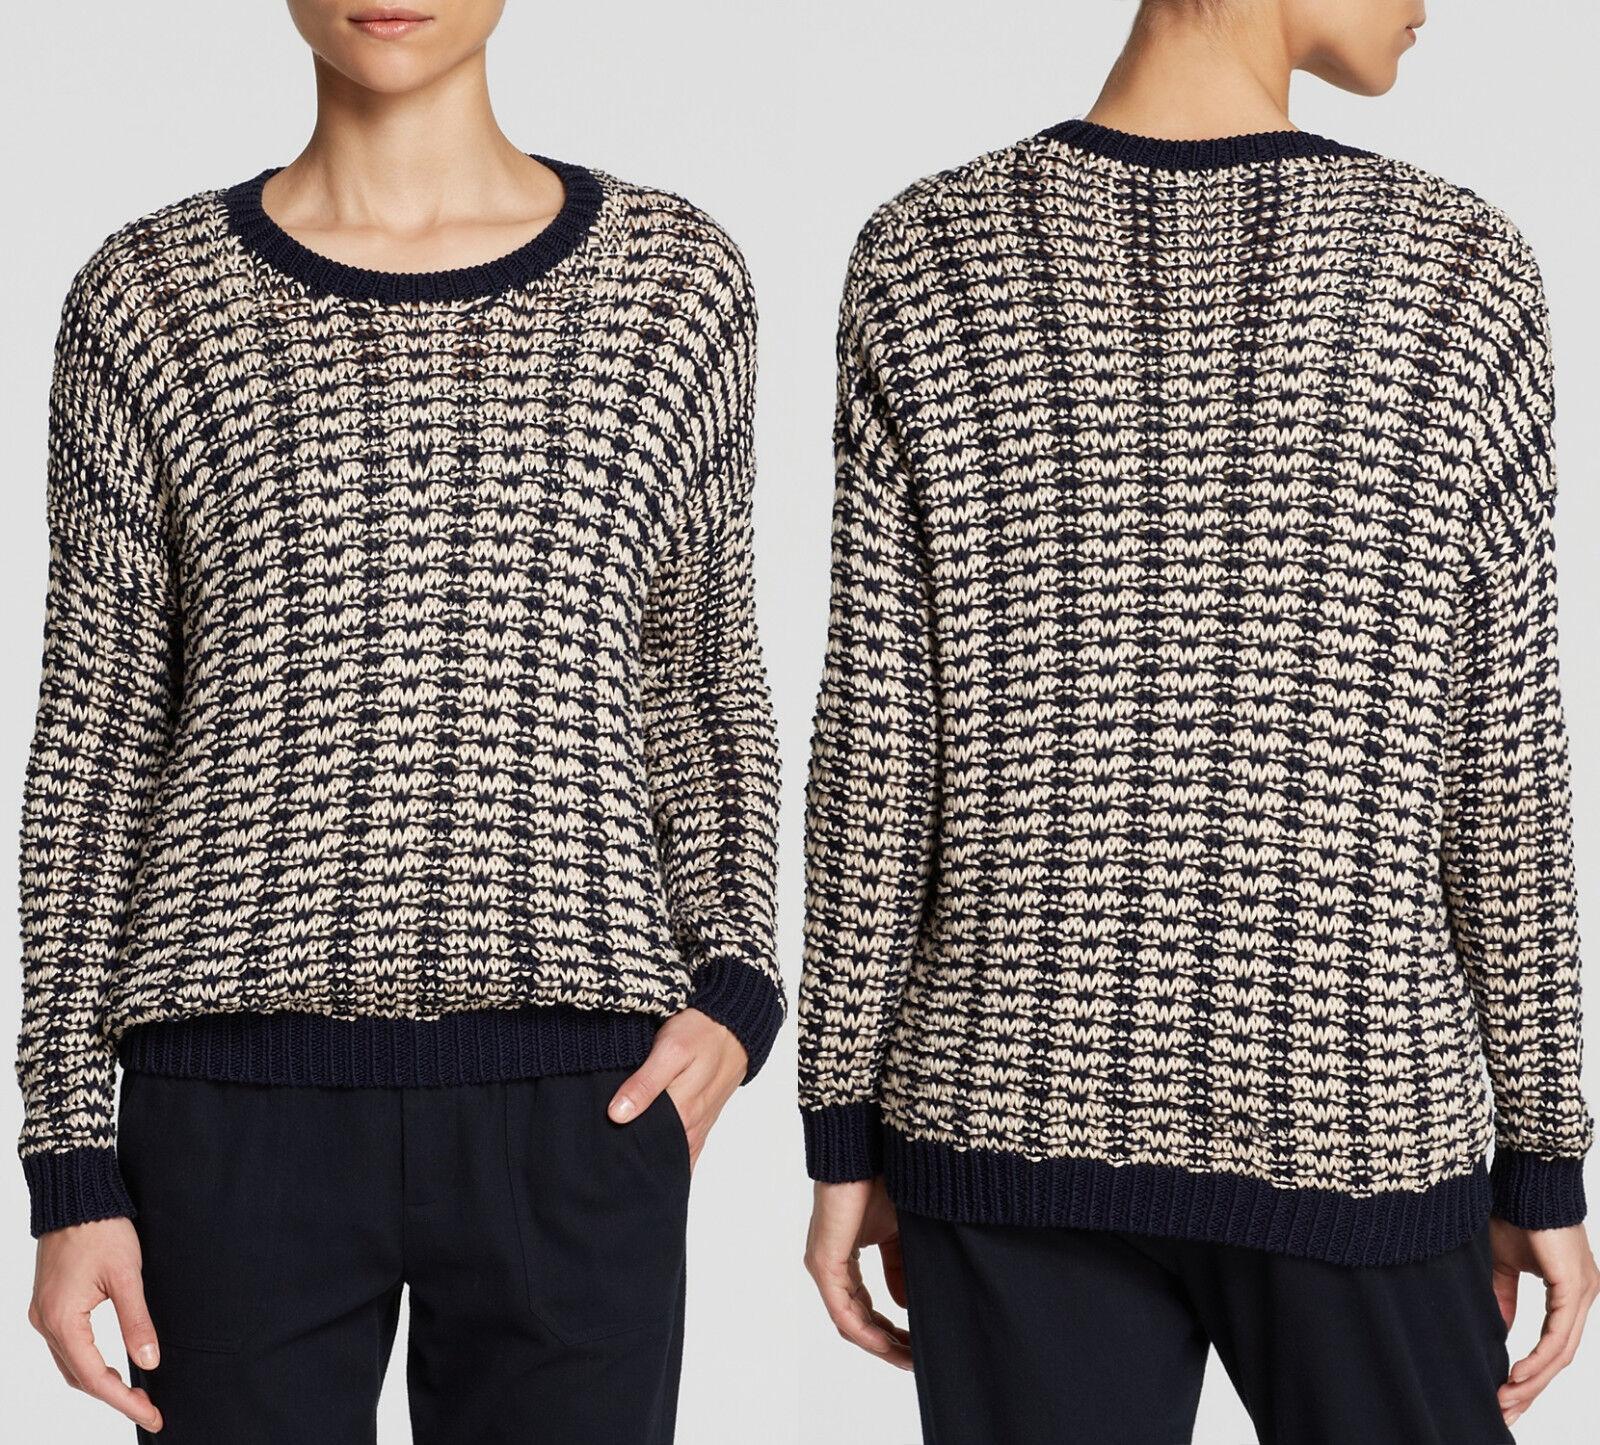 NWT  Vince Women's Vince Mercerized Cotton Textured Knit Sweater